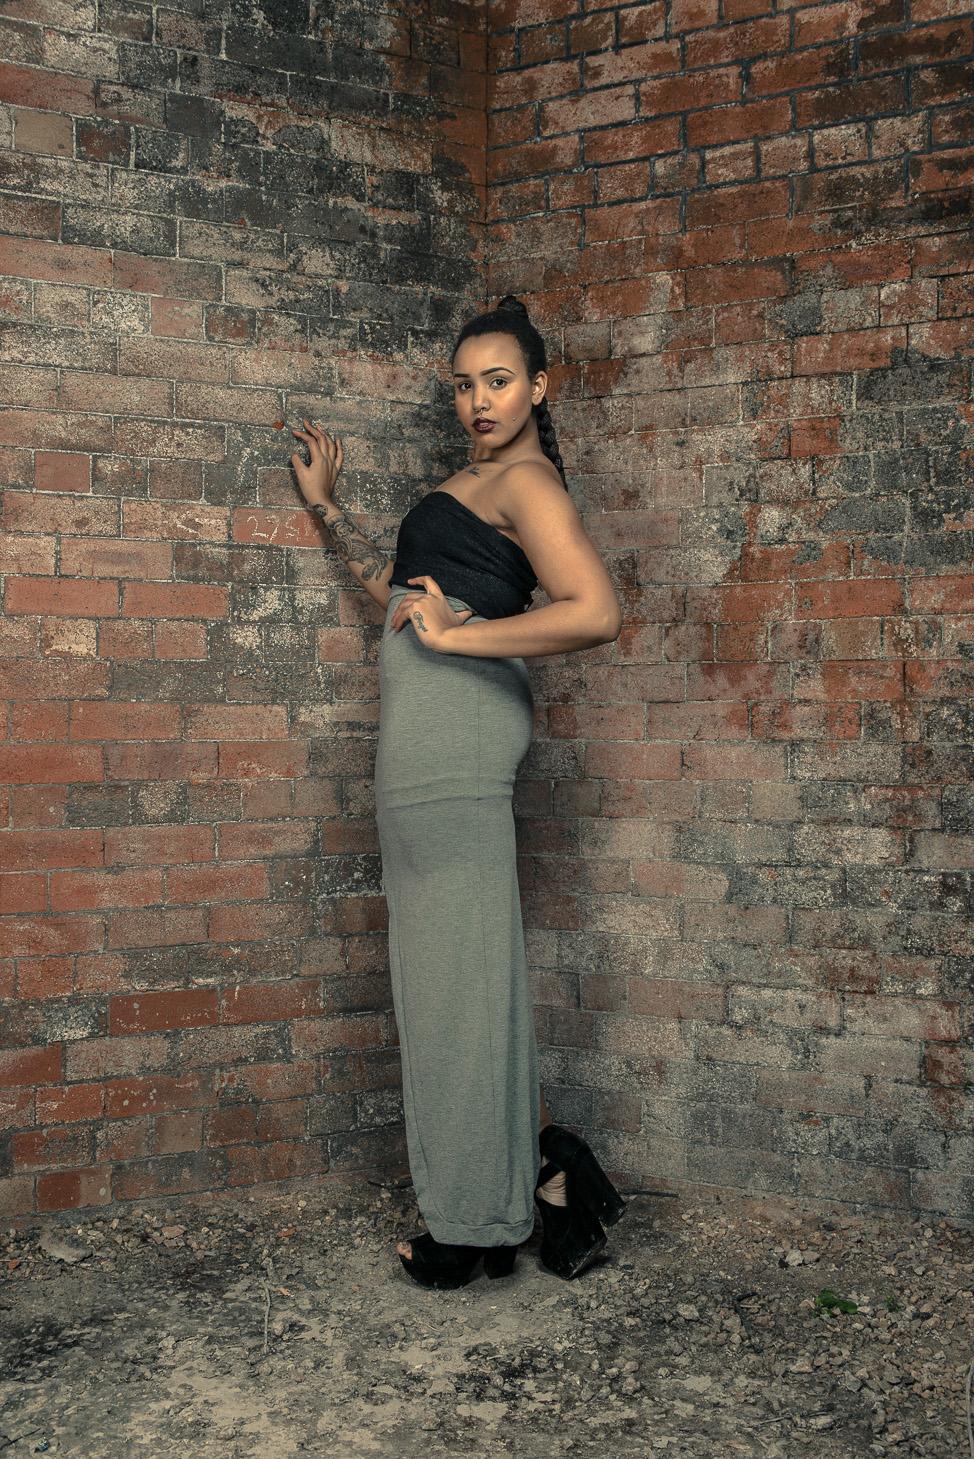 zaramia-ava-zaramiaava-leeds-fashion-designer-ethical-sustainable-tailored-minimalist-skirt-bandeau-maxi-versatile-drape-grey-bodysuit-black-obi-belt-wrap-cowl-styling-womenswear-models-photoshoot-31